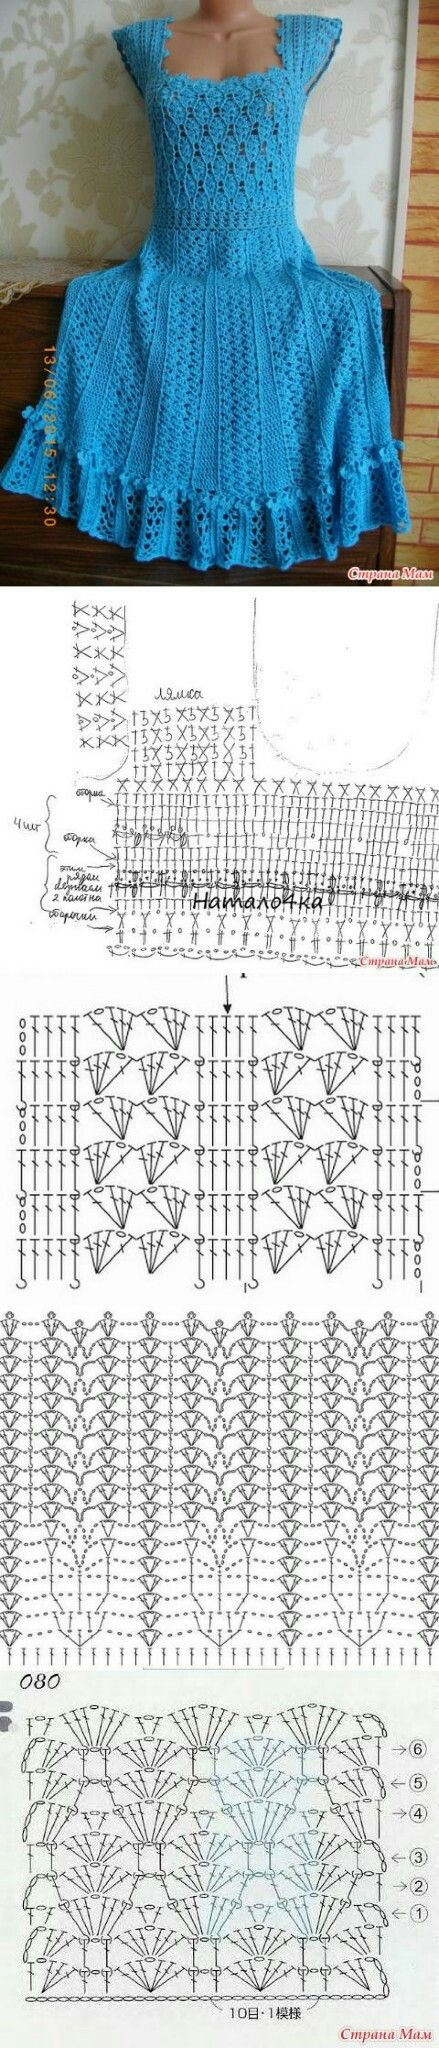 Outstanding Häkeln Willie Wärmer Muster Frei Elaboration - Decke ...